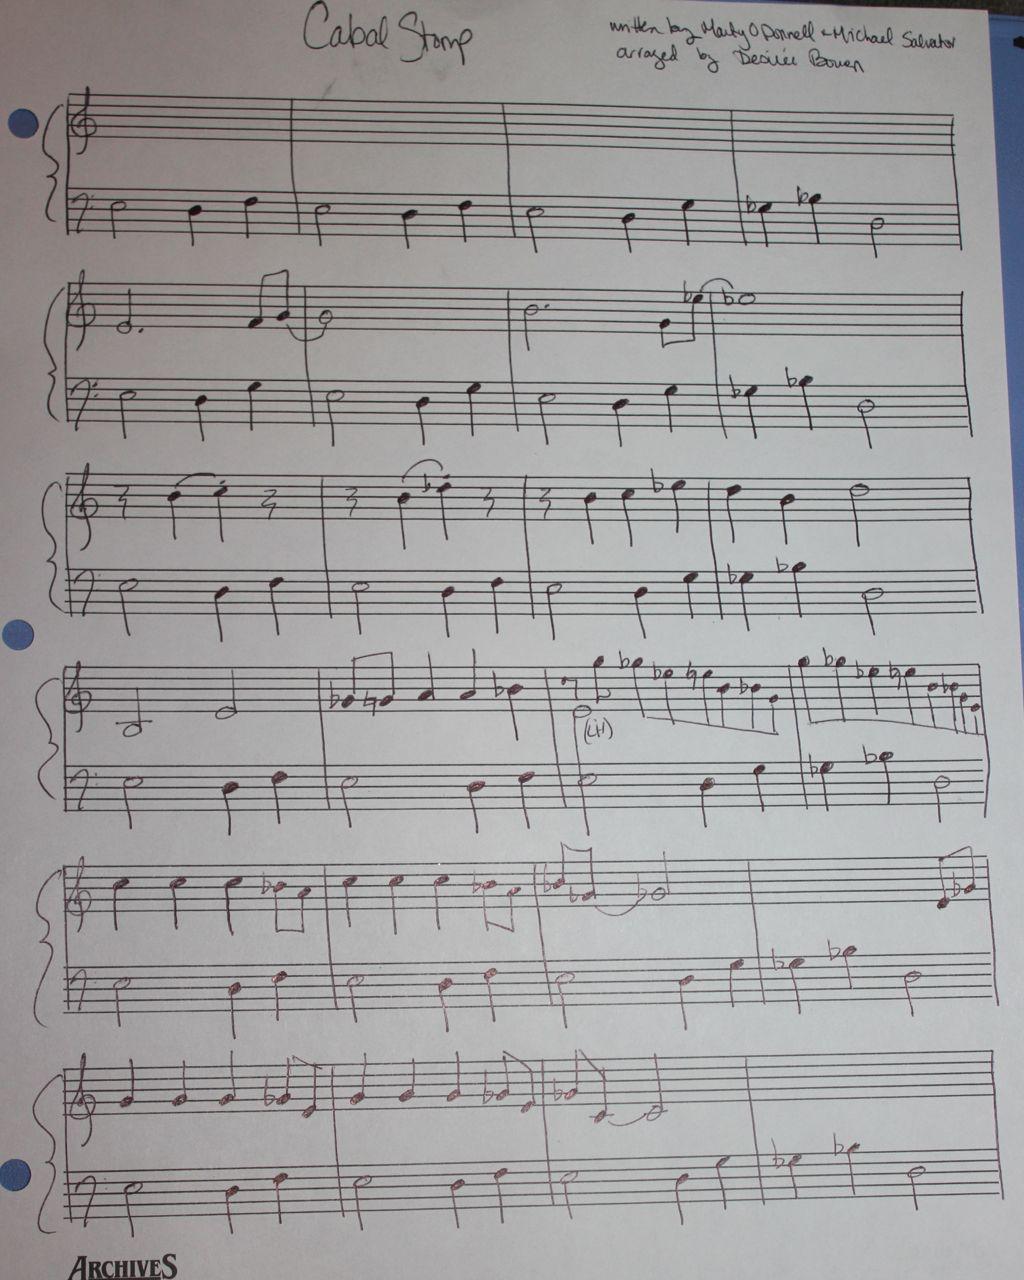 Drawn music destiny The Imgur Here music: sorry!!)